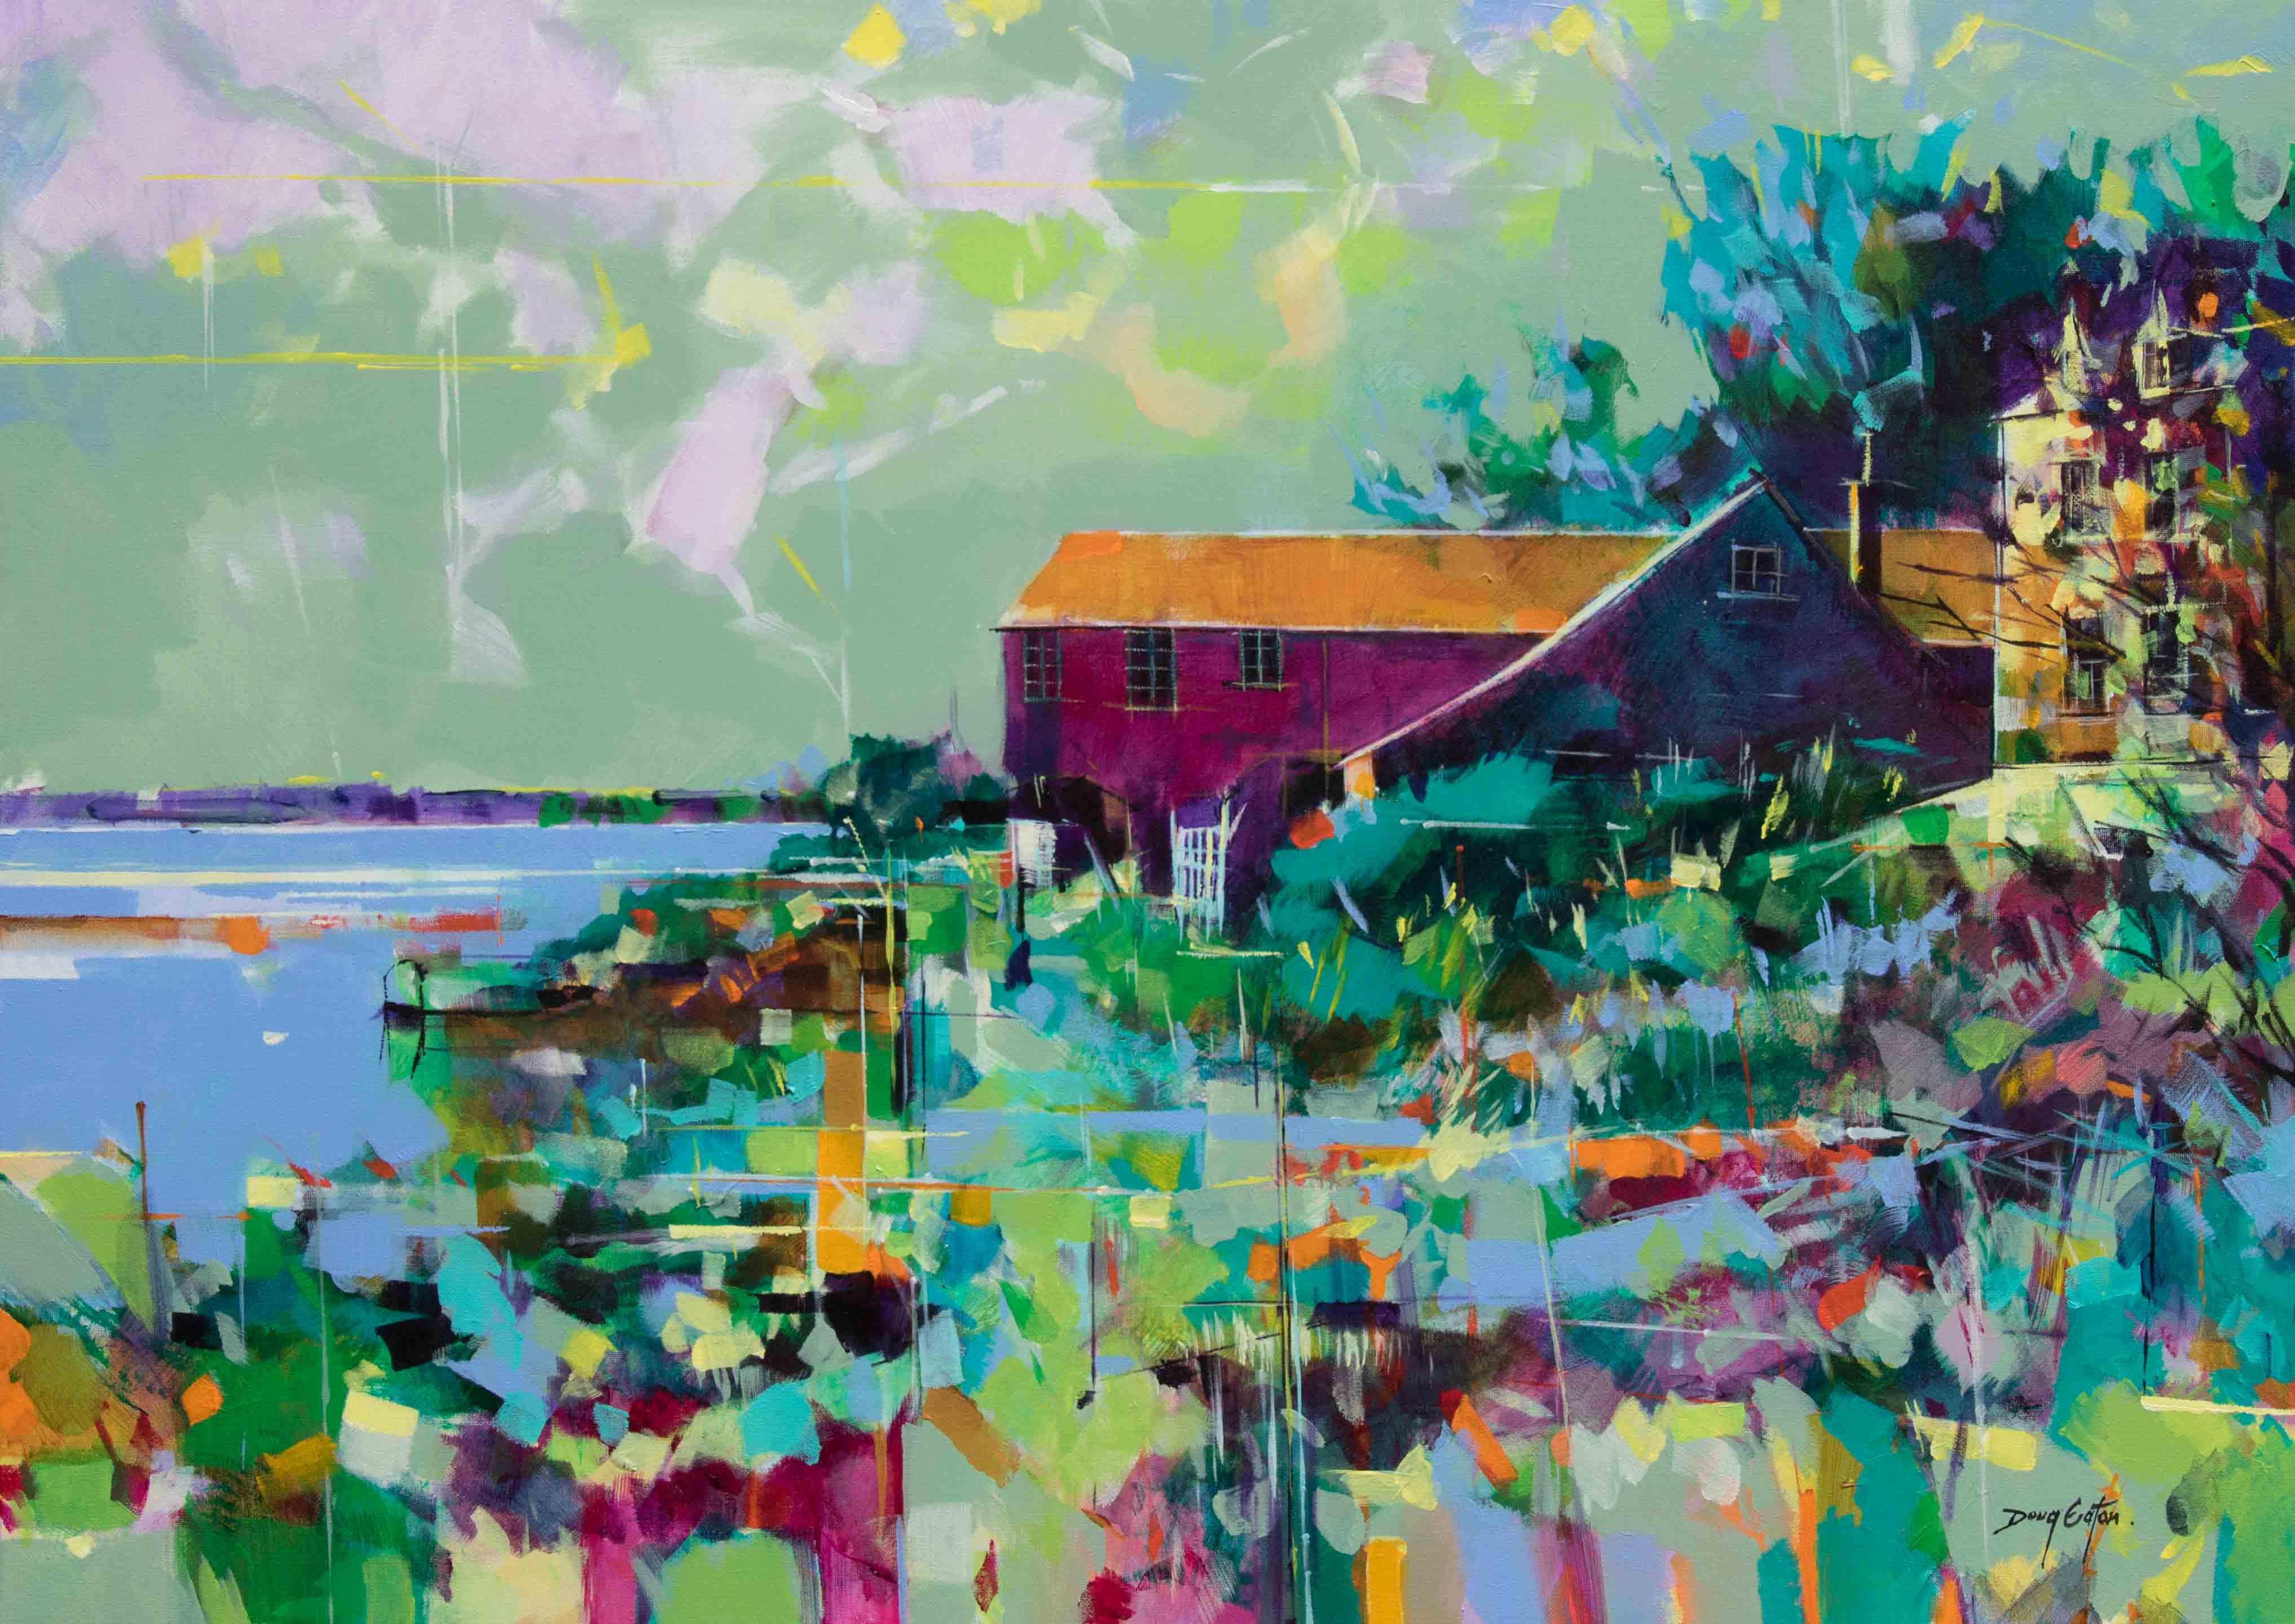 doug-eaton-river-severn-painting